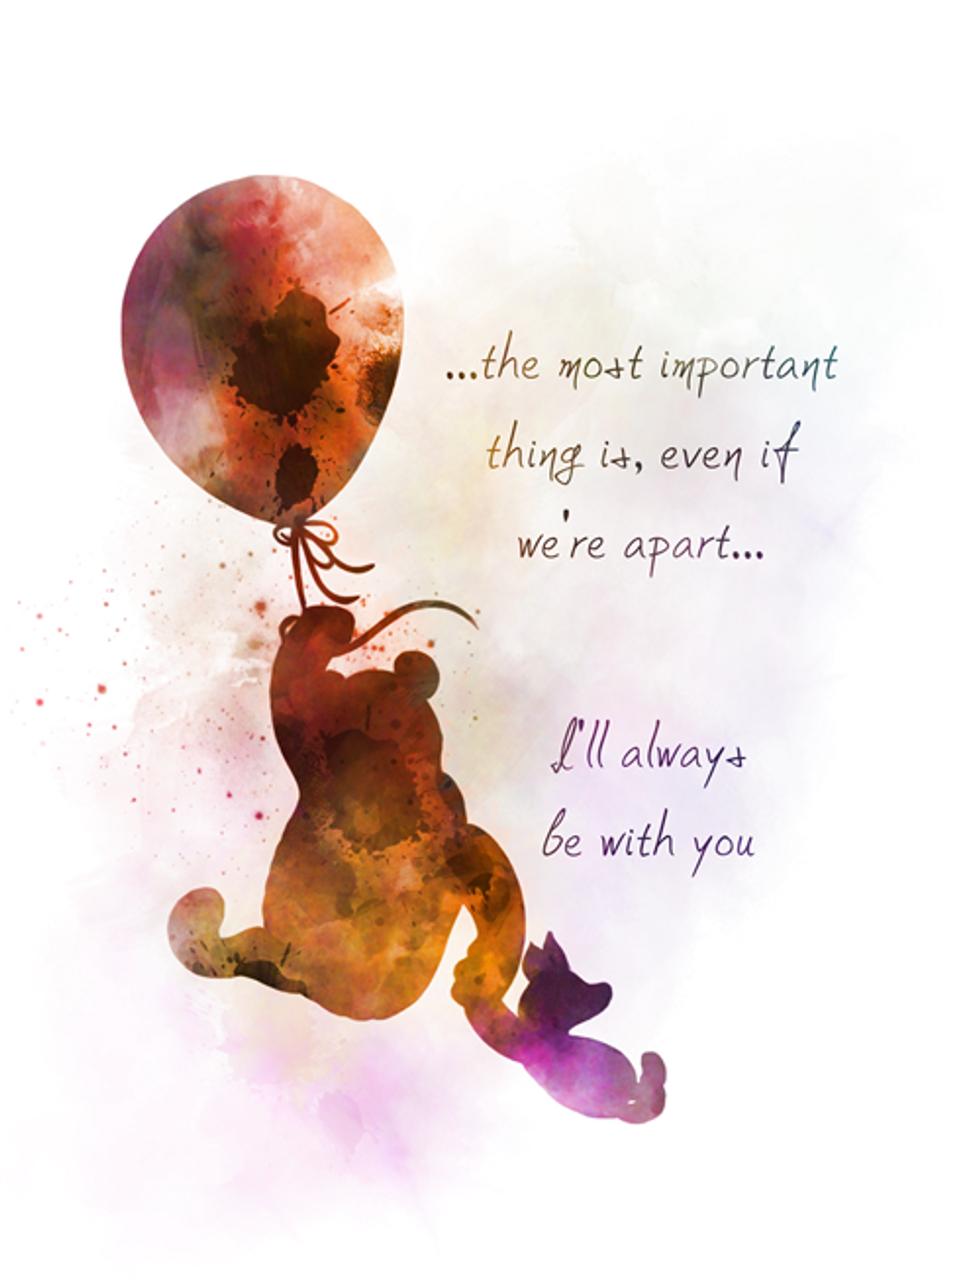 Winnie the Pooh Quote ART PRINT, Balloon, Piglet, Nursery, Gift, Wall Art,  Home Decor